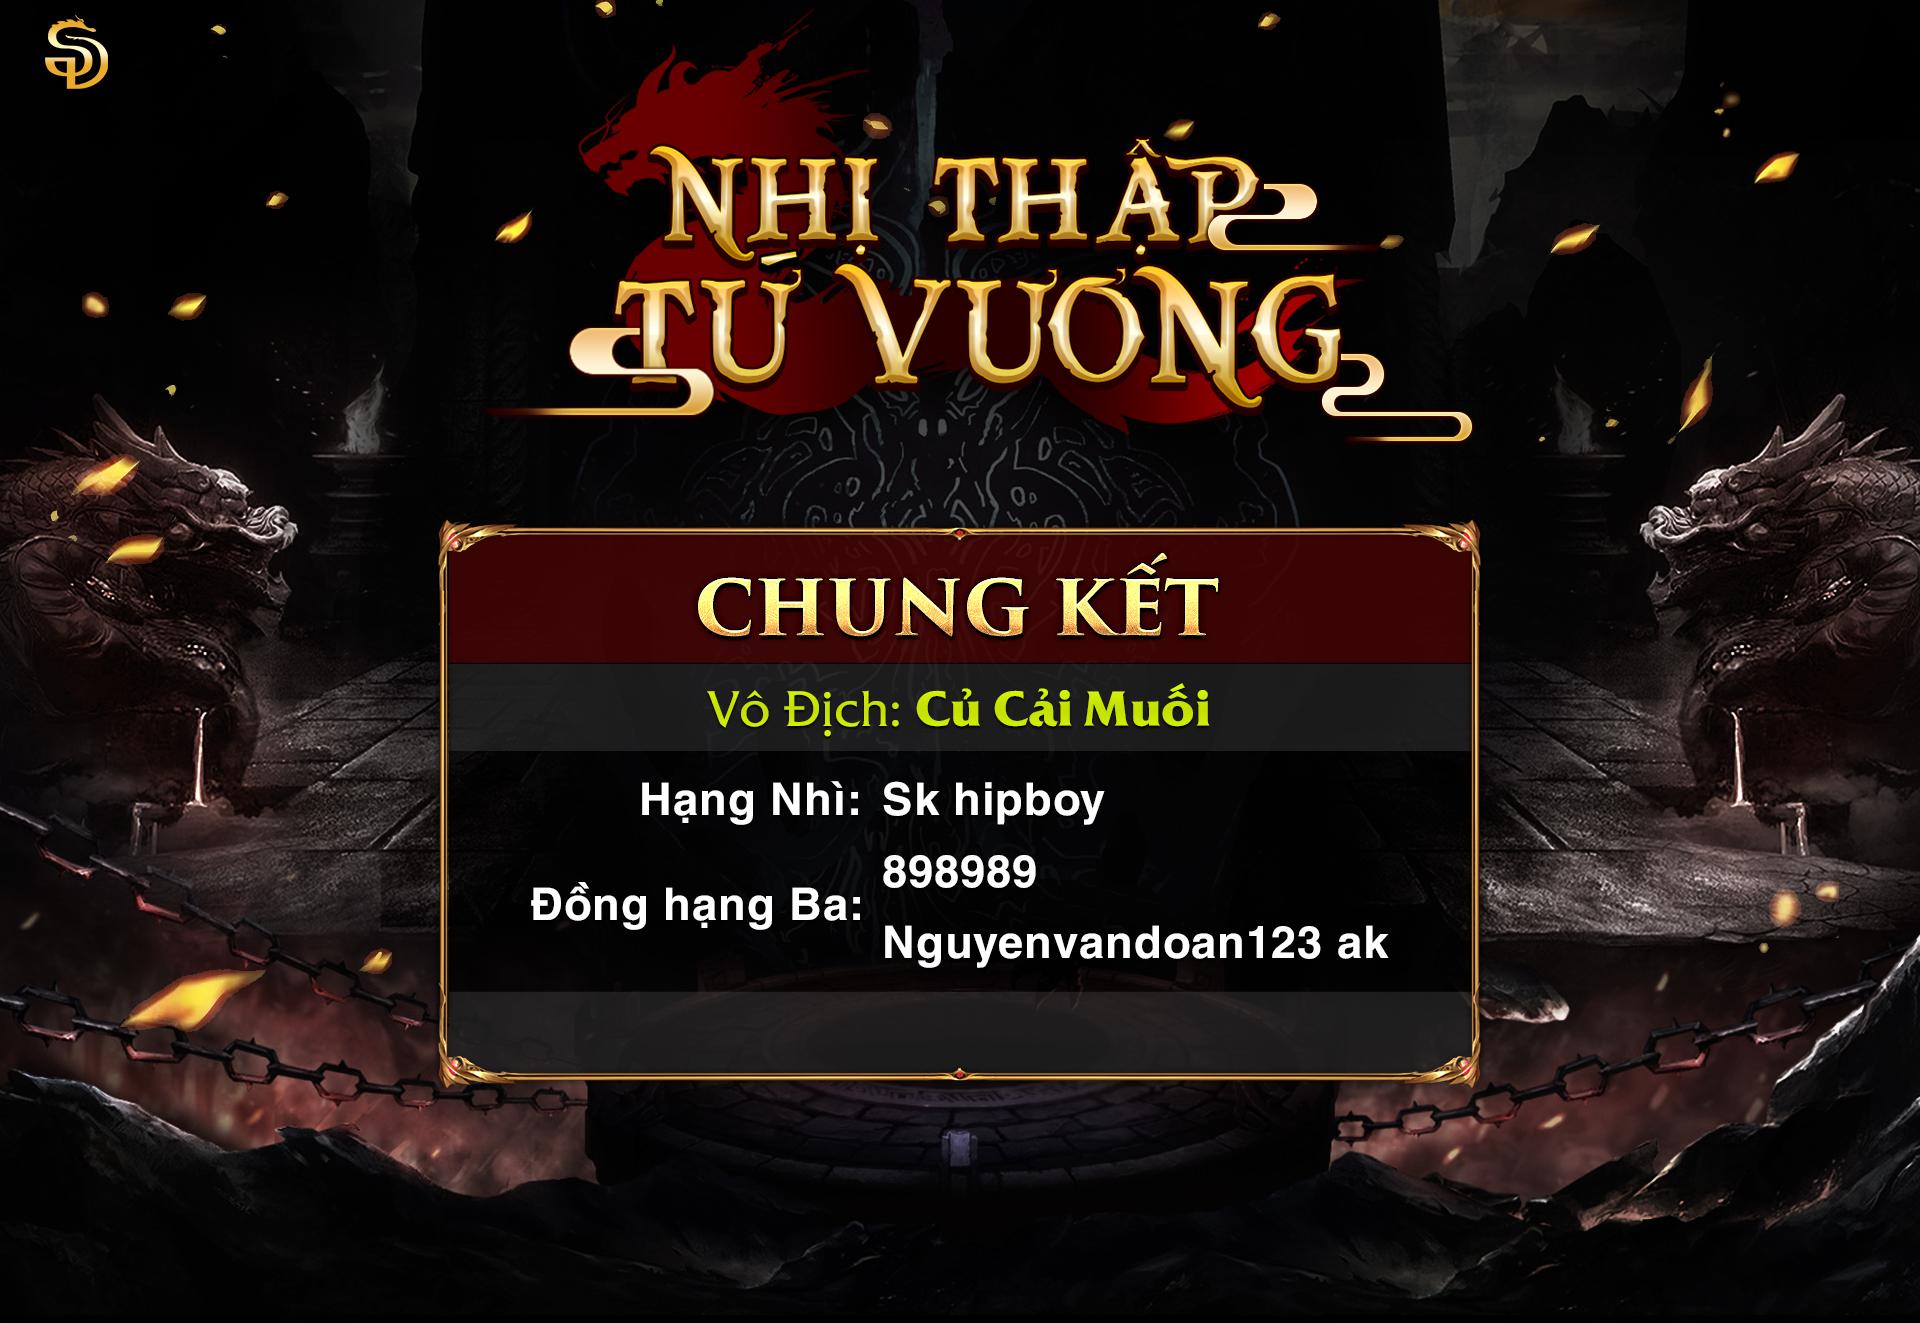 nhithaptuvuong_ketquaCK.